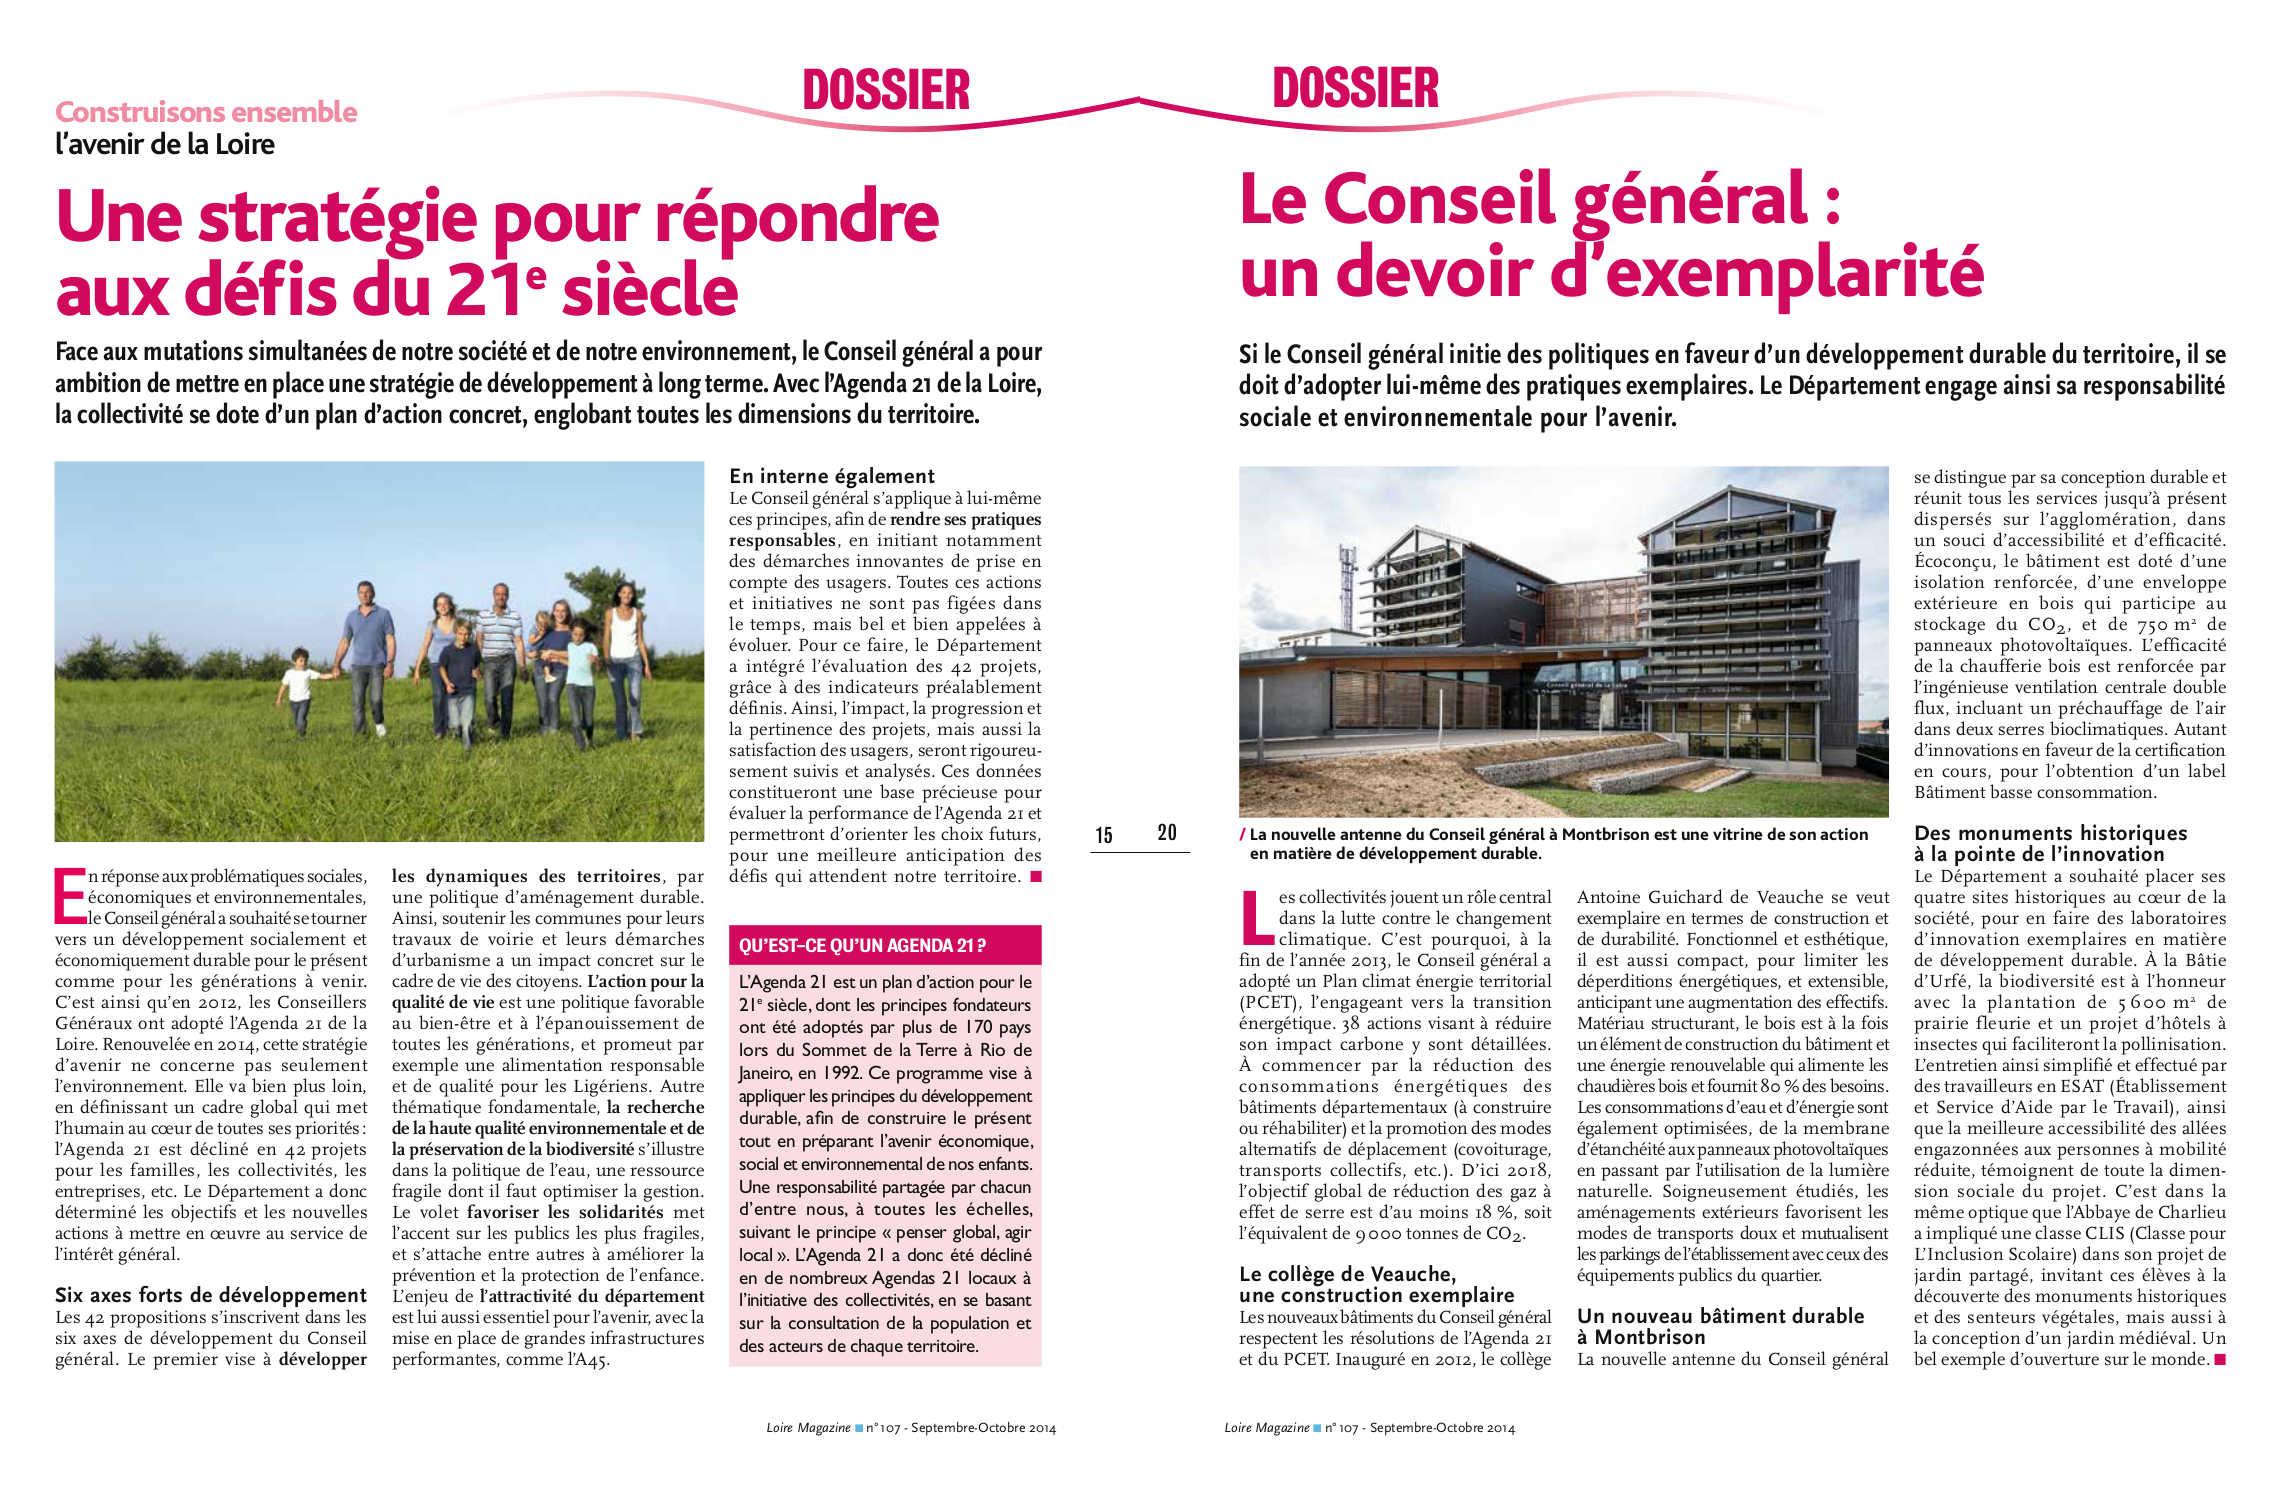 dossier magazine